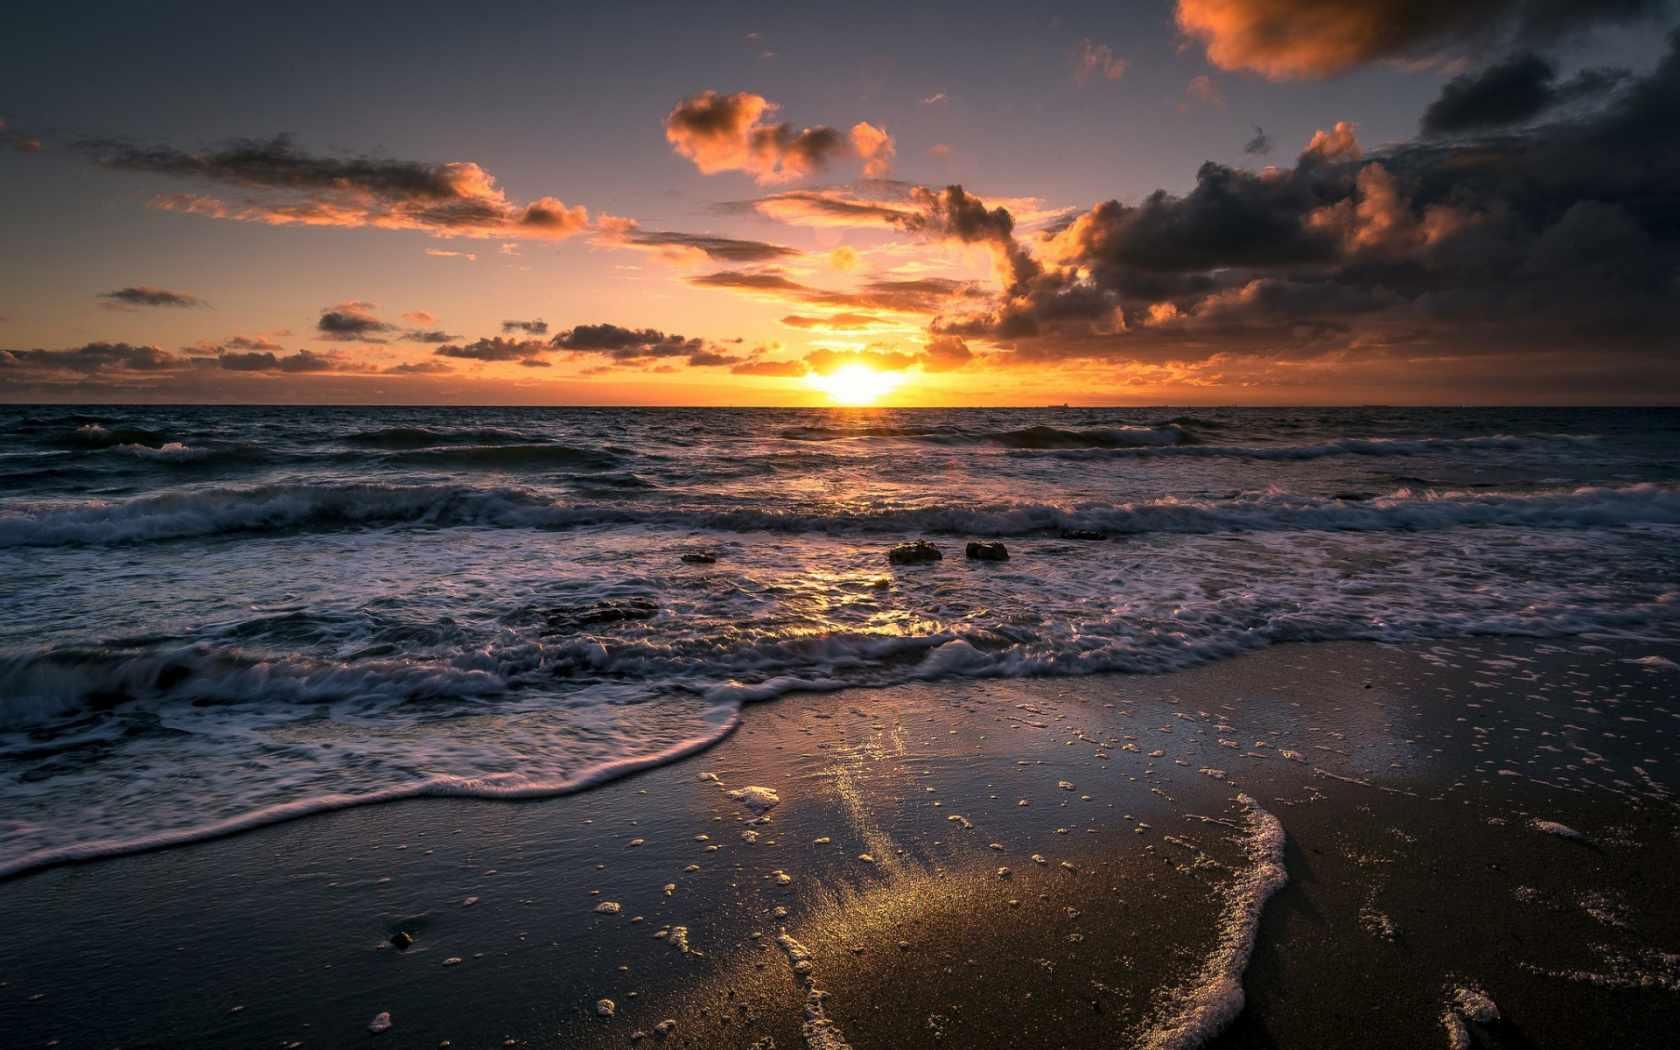 Free ocean wallpaper featuring a beach view of a sunrise over foamy ocean